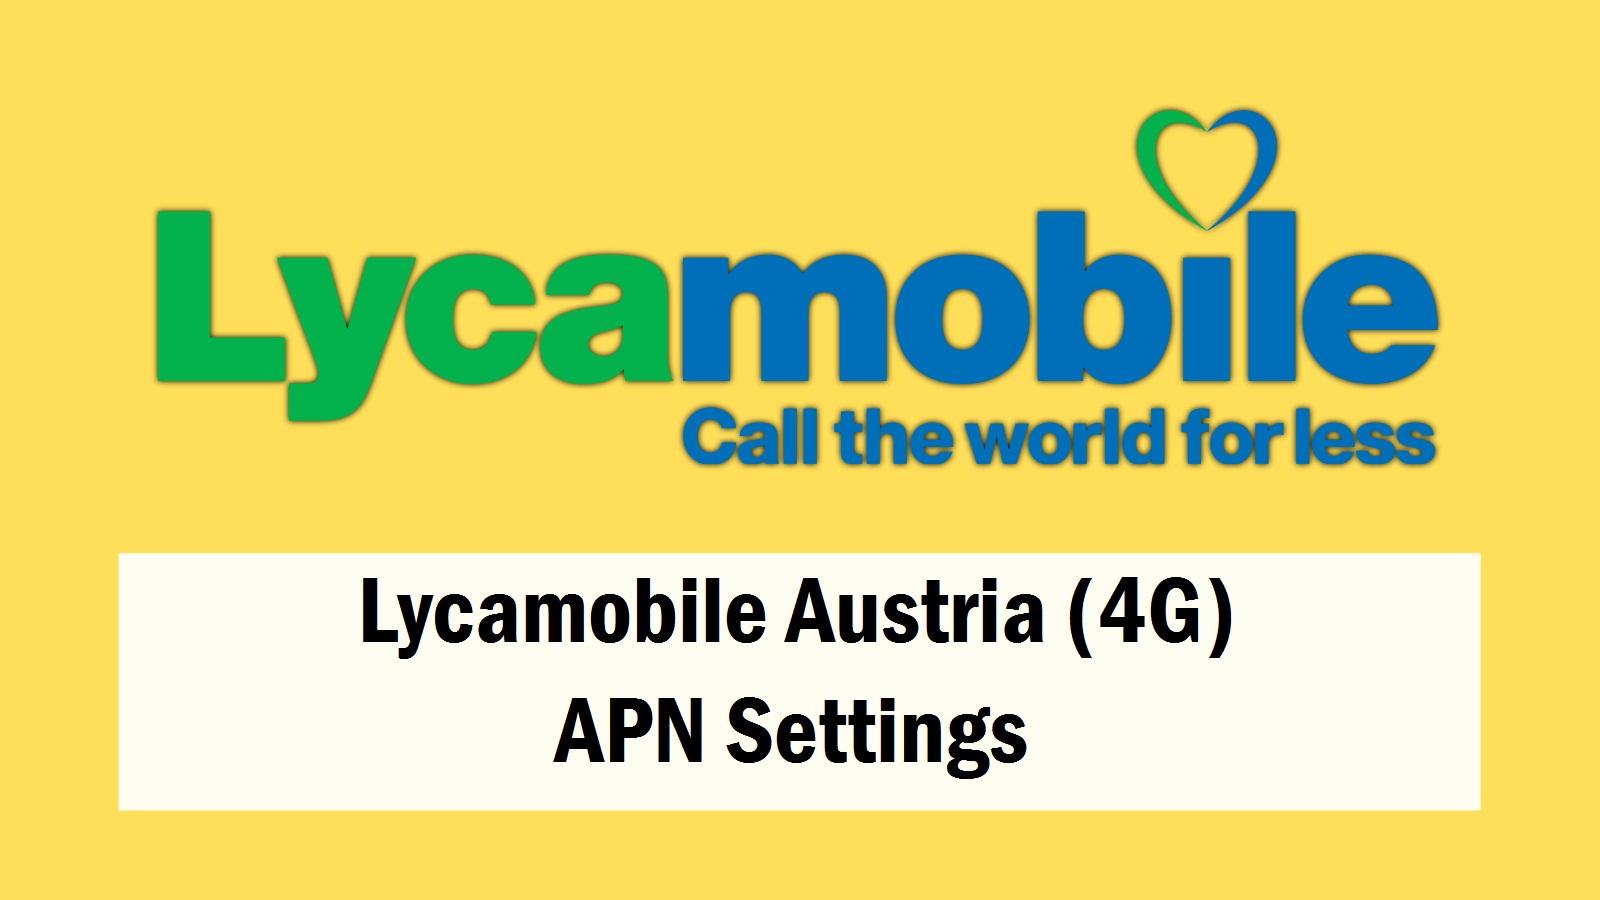 Lycamobile Austria APN Settings